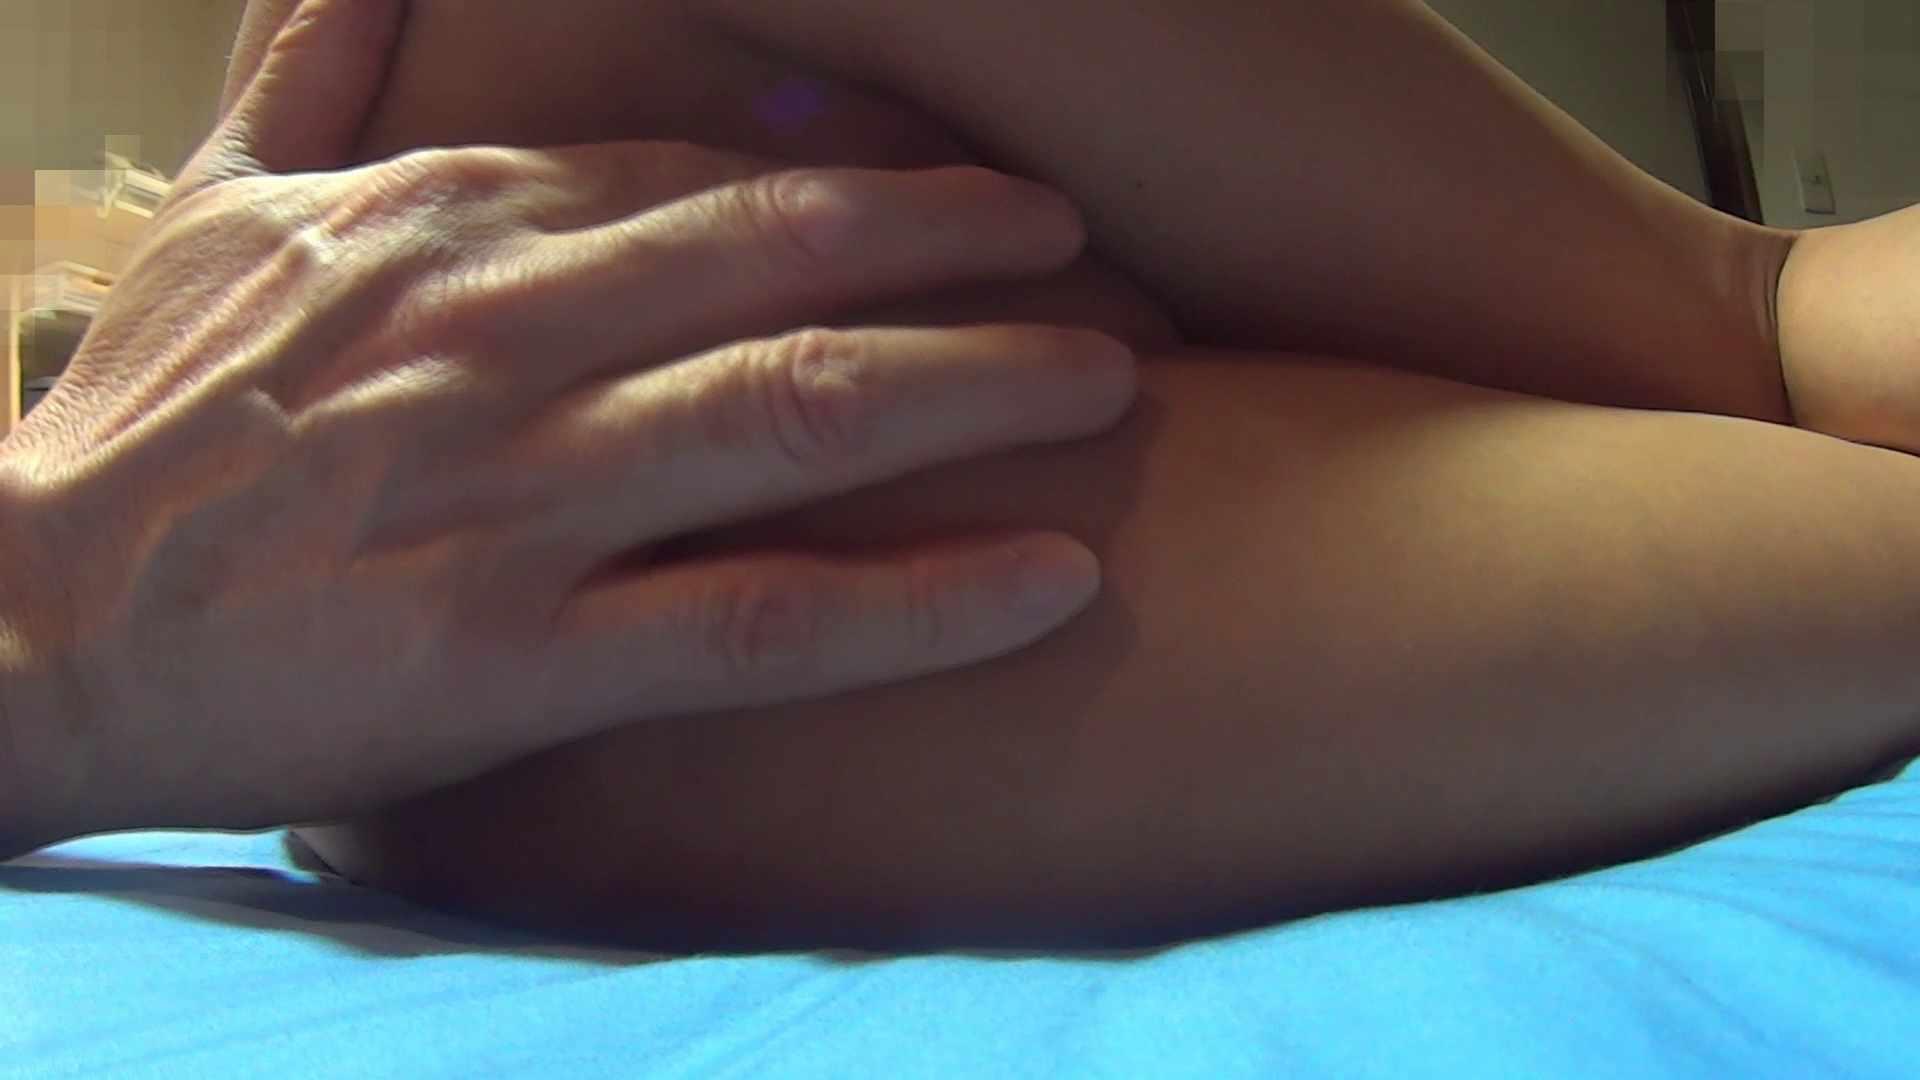 【HD】理性<欲求 Vol.02 嫁の姉 美しいOLの裸体 | 反撃の悪戯  84pic 45